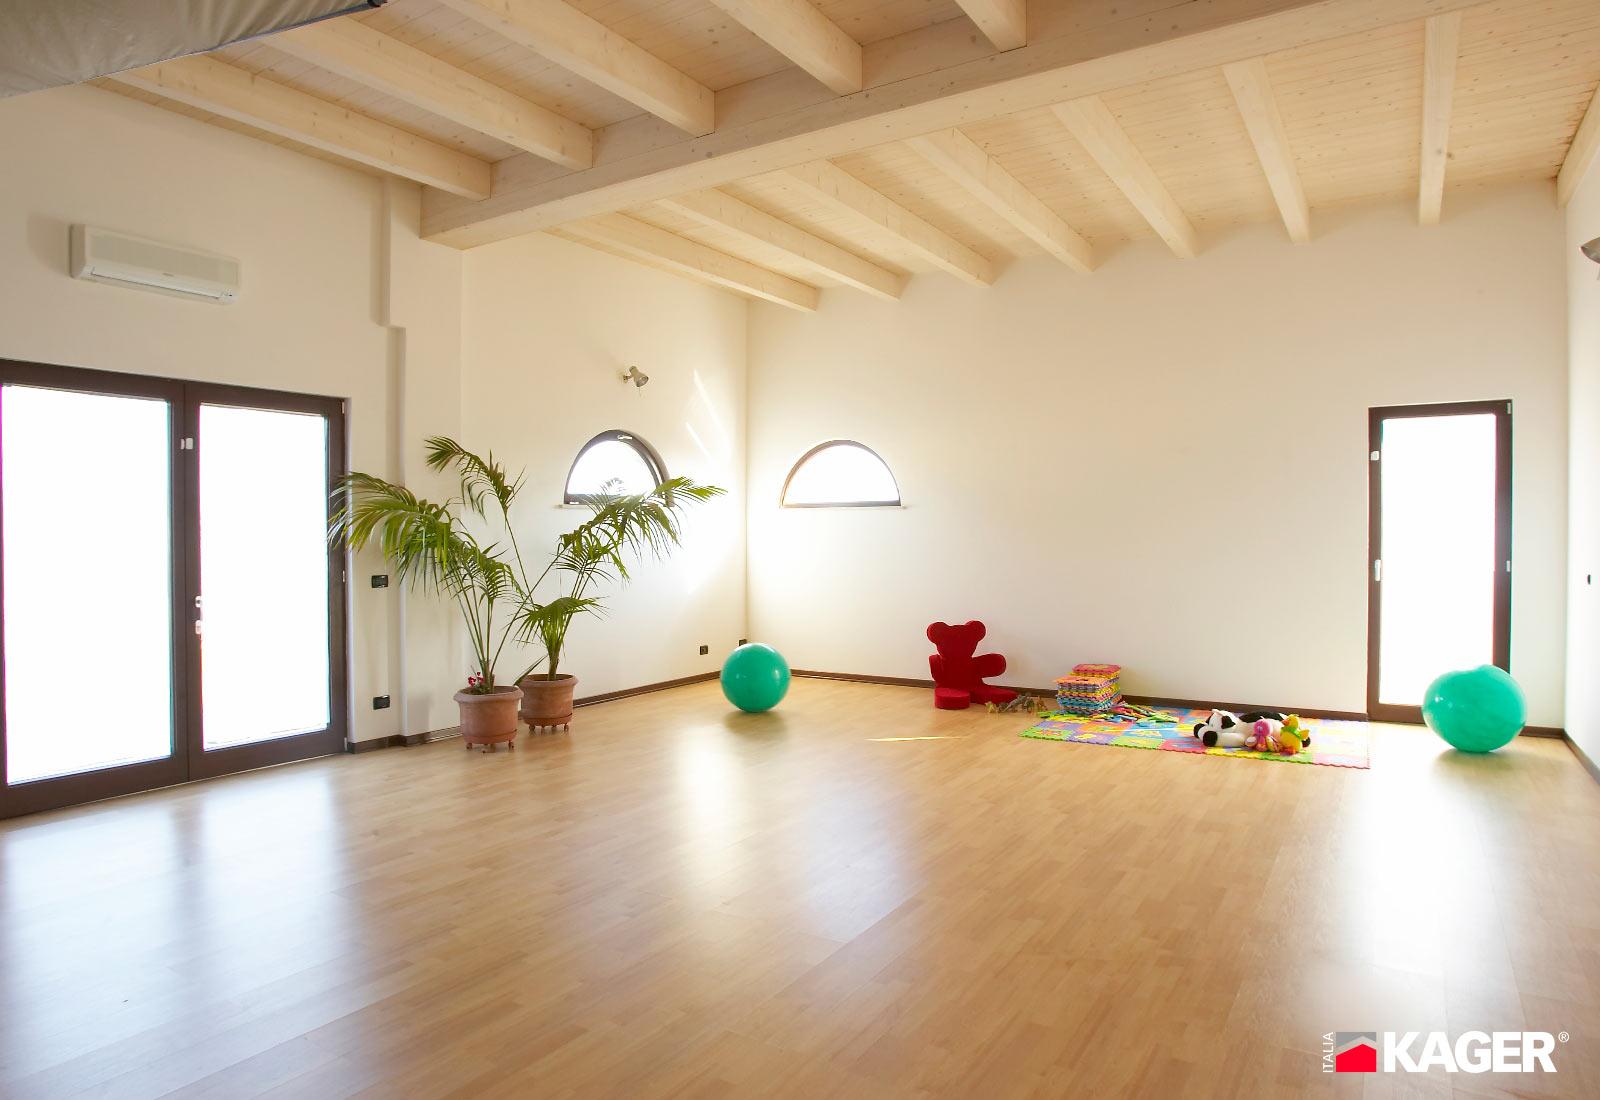 Casa-in-legno-Ferrara-Kager-Italia-12